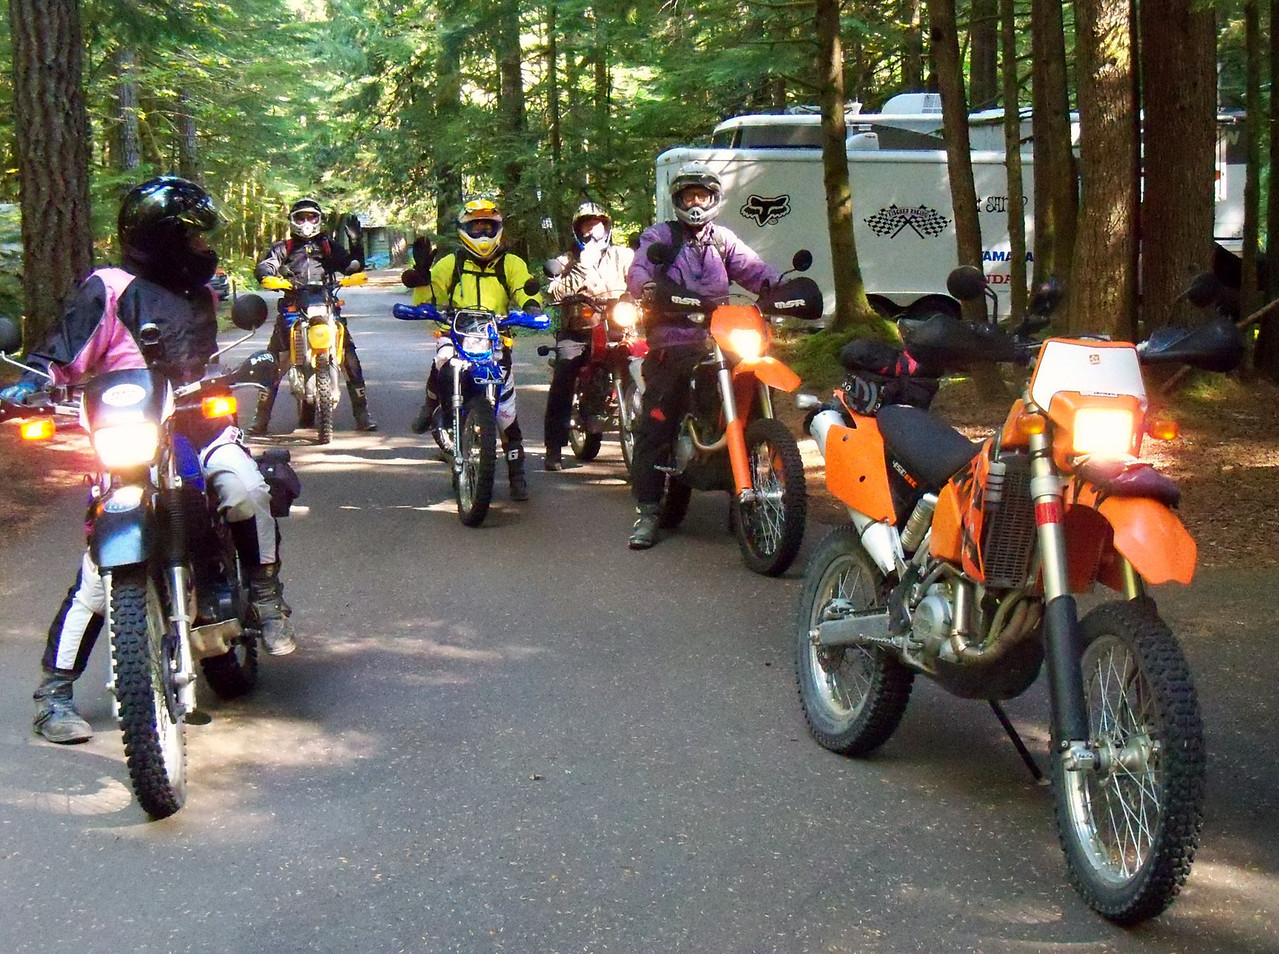 Preparing for Wednesday's Dual Sport Ride to Burley LO & Krause Ridge